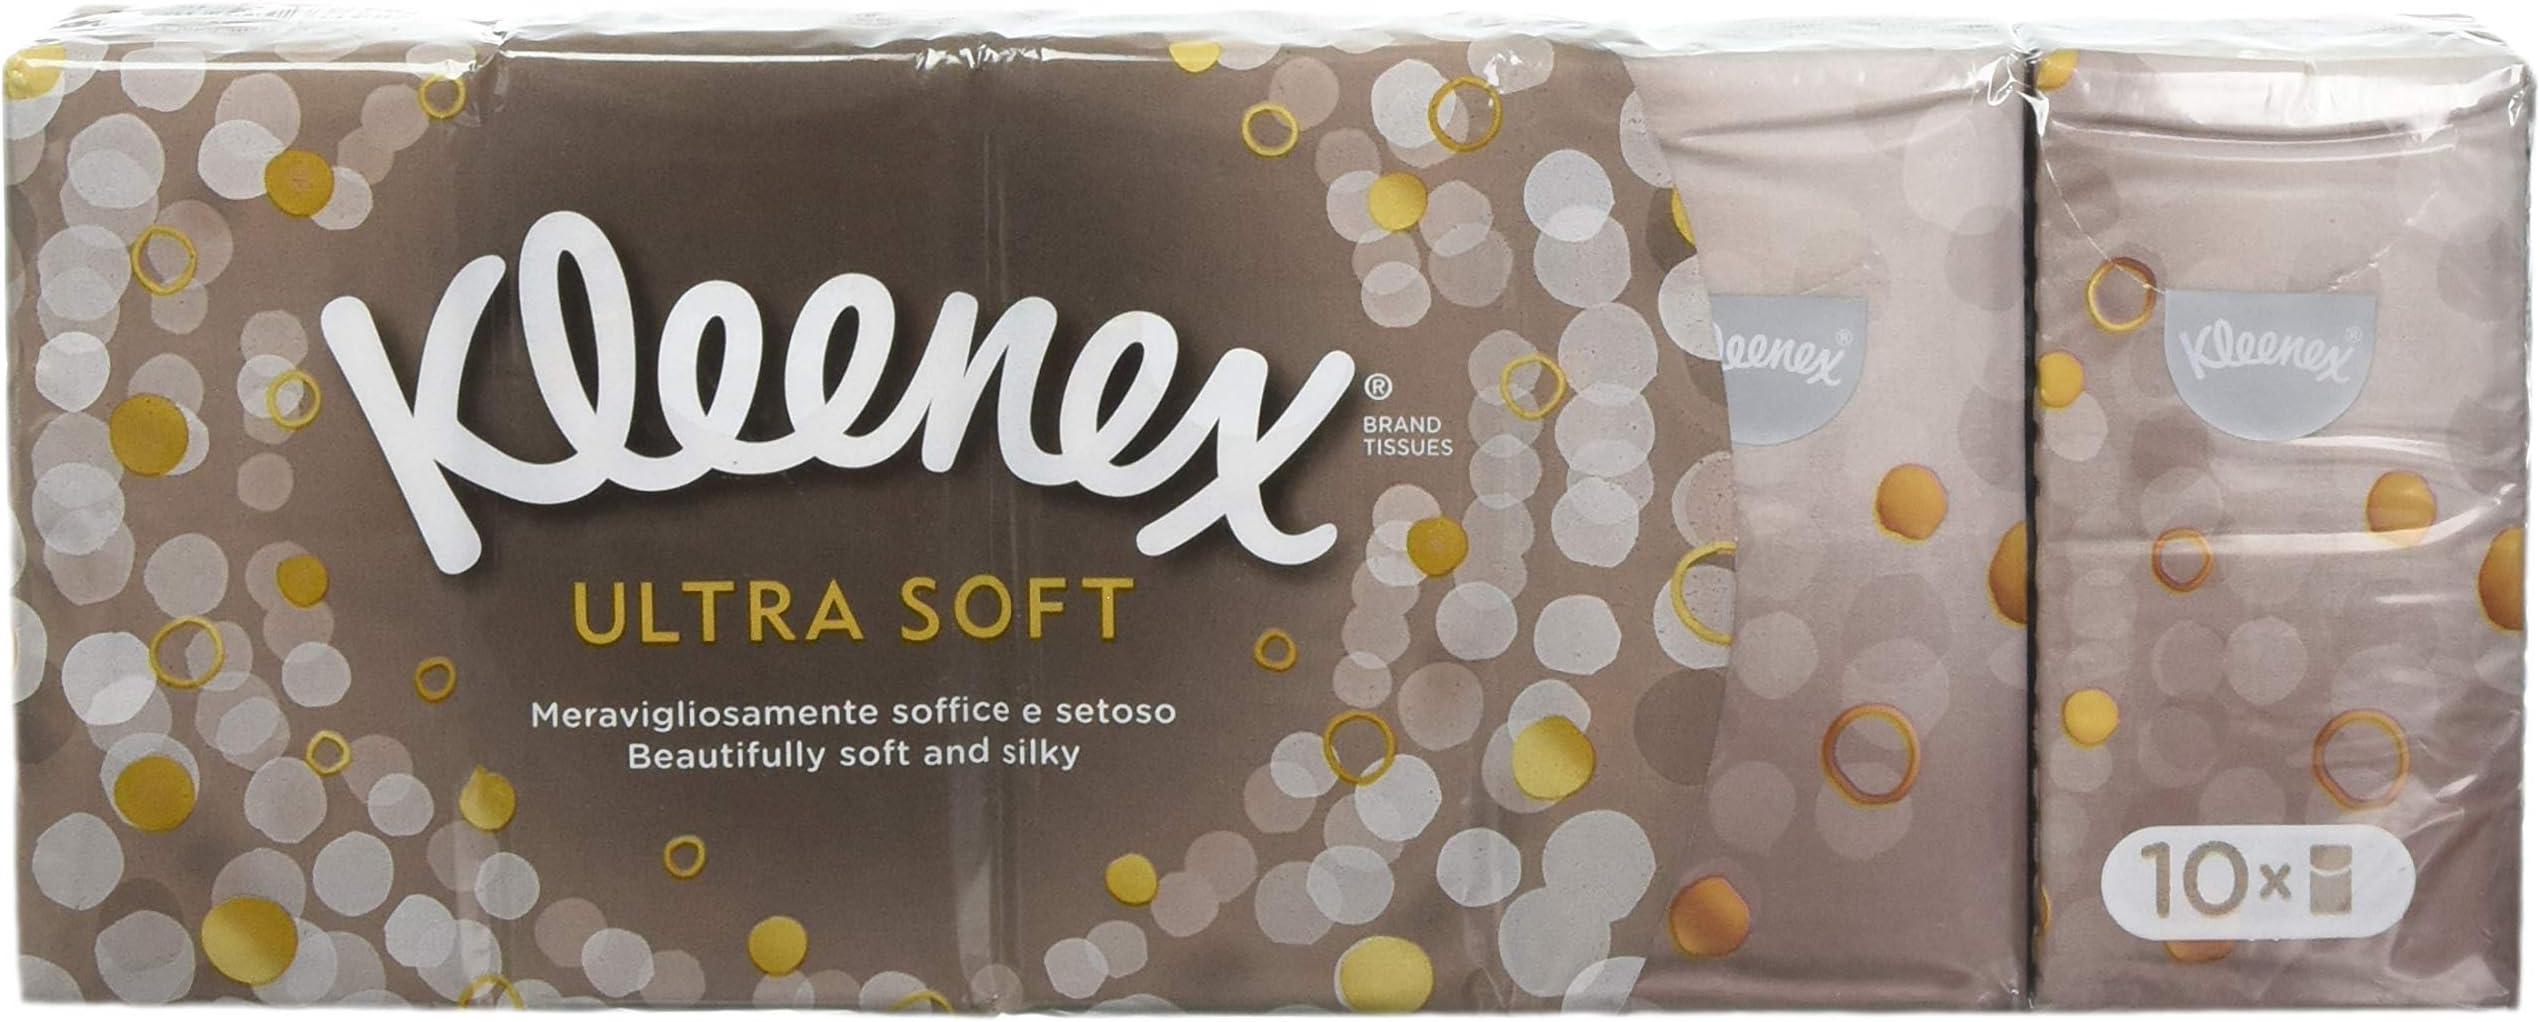 Kleenex Original Pocket Packs 9 Sheets